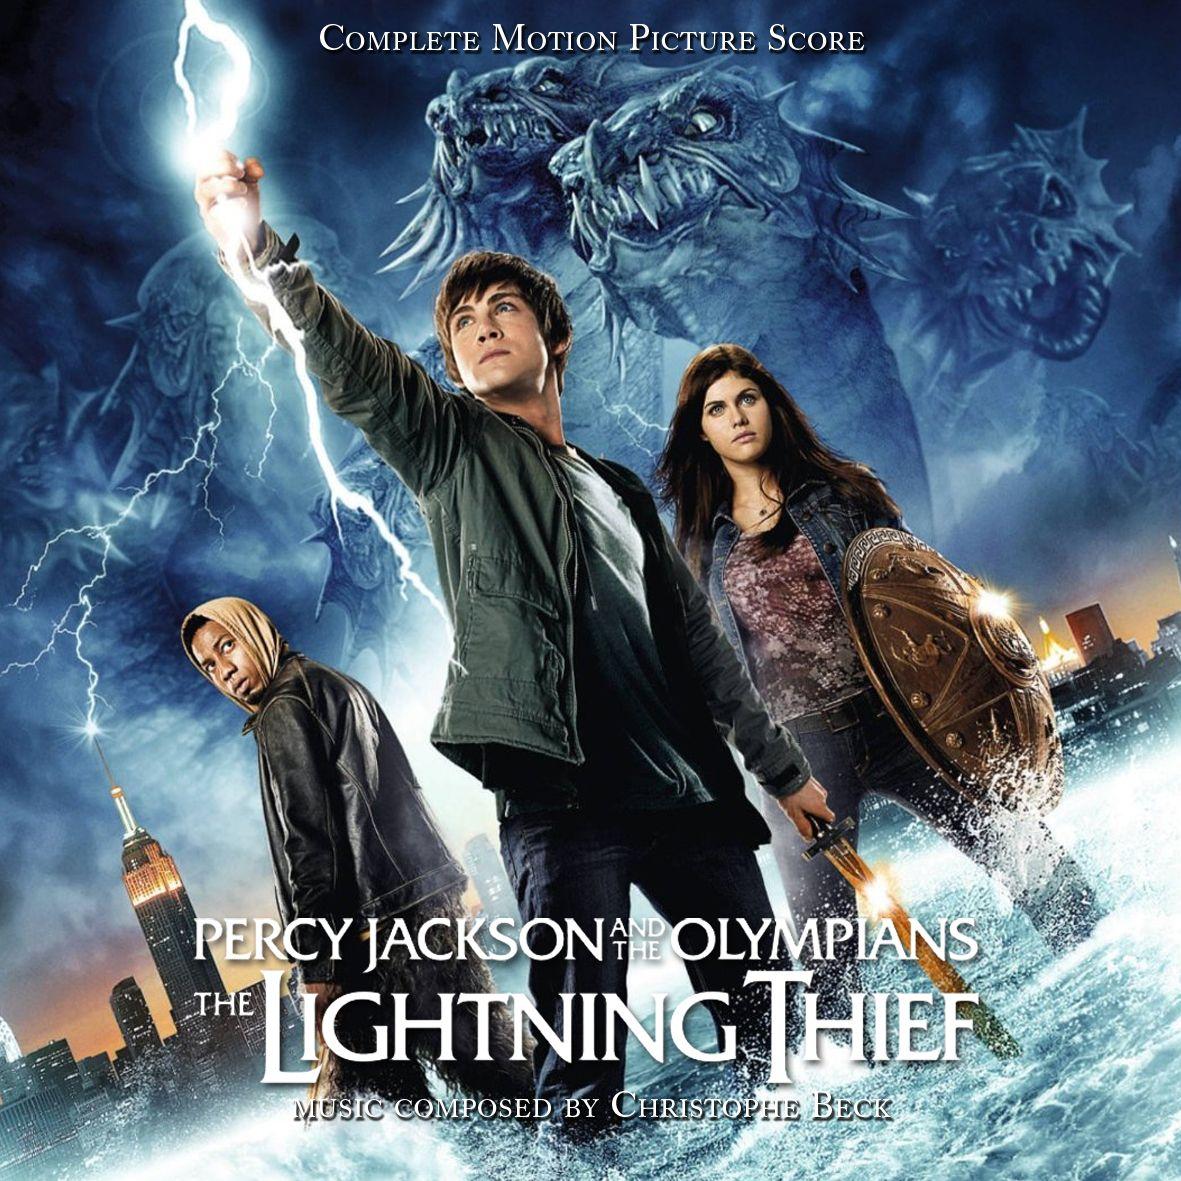 Percy jackson the olympians the lightning thief